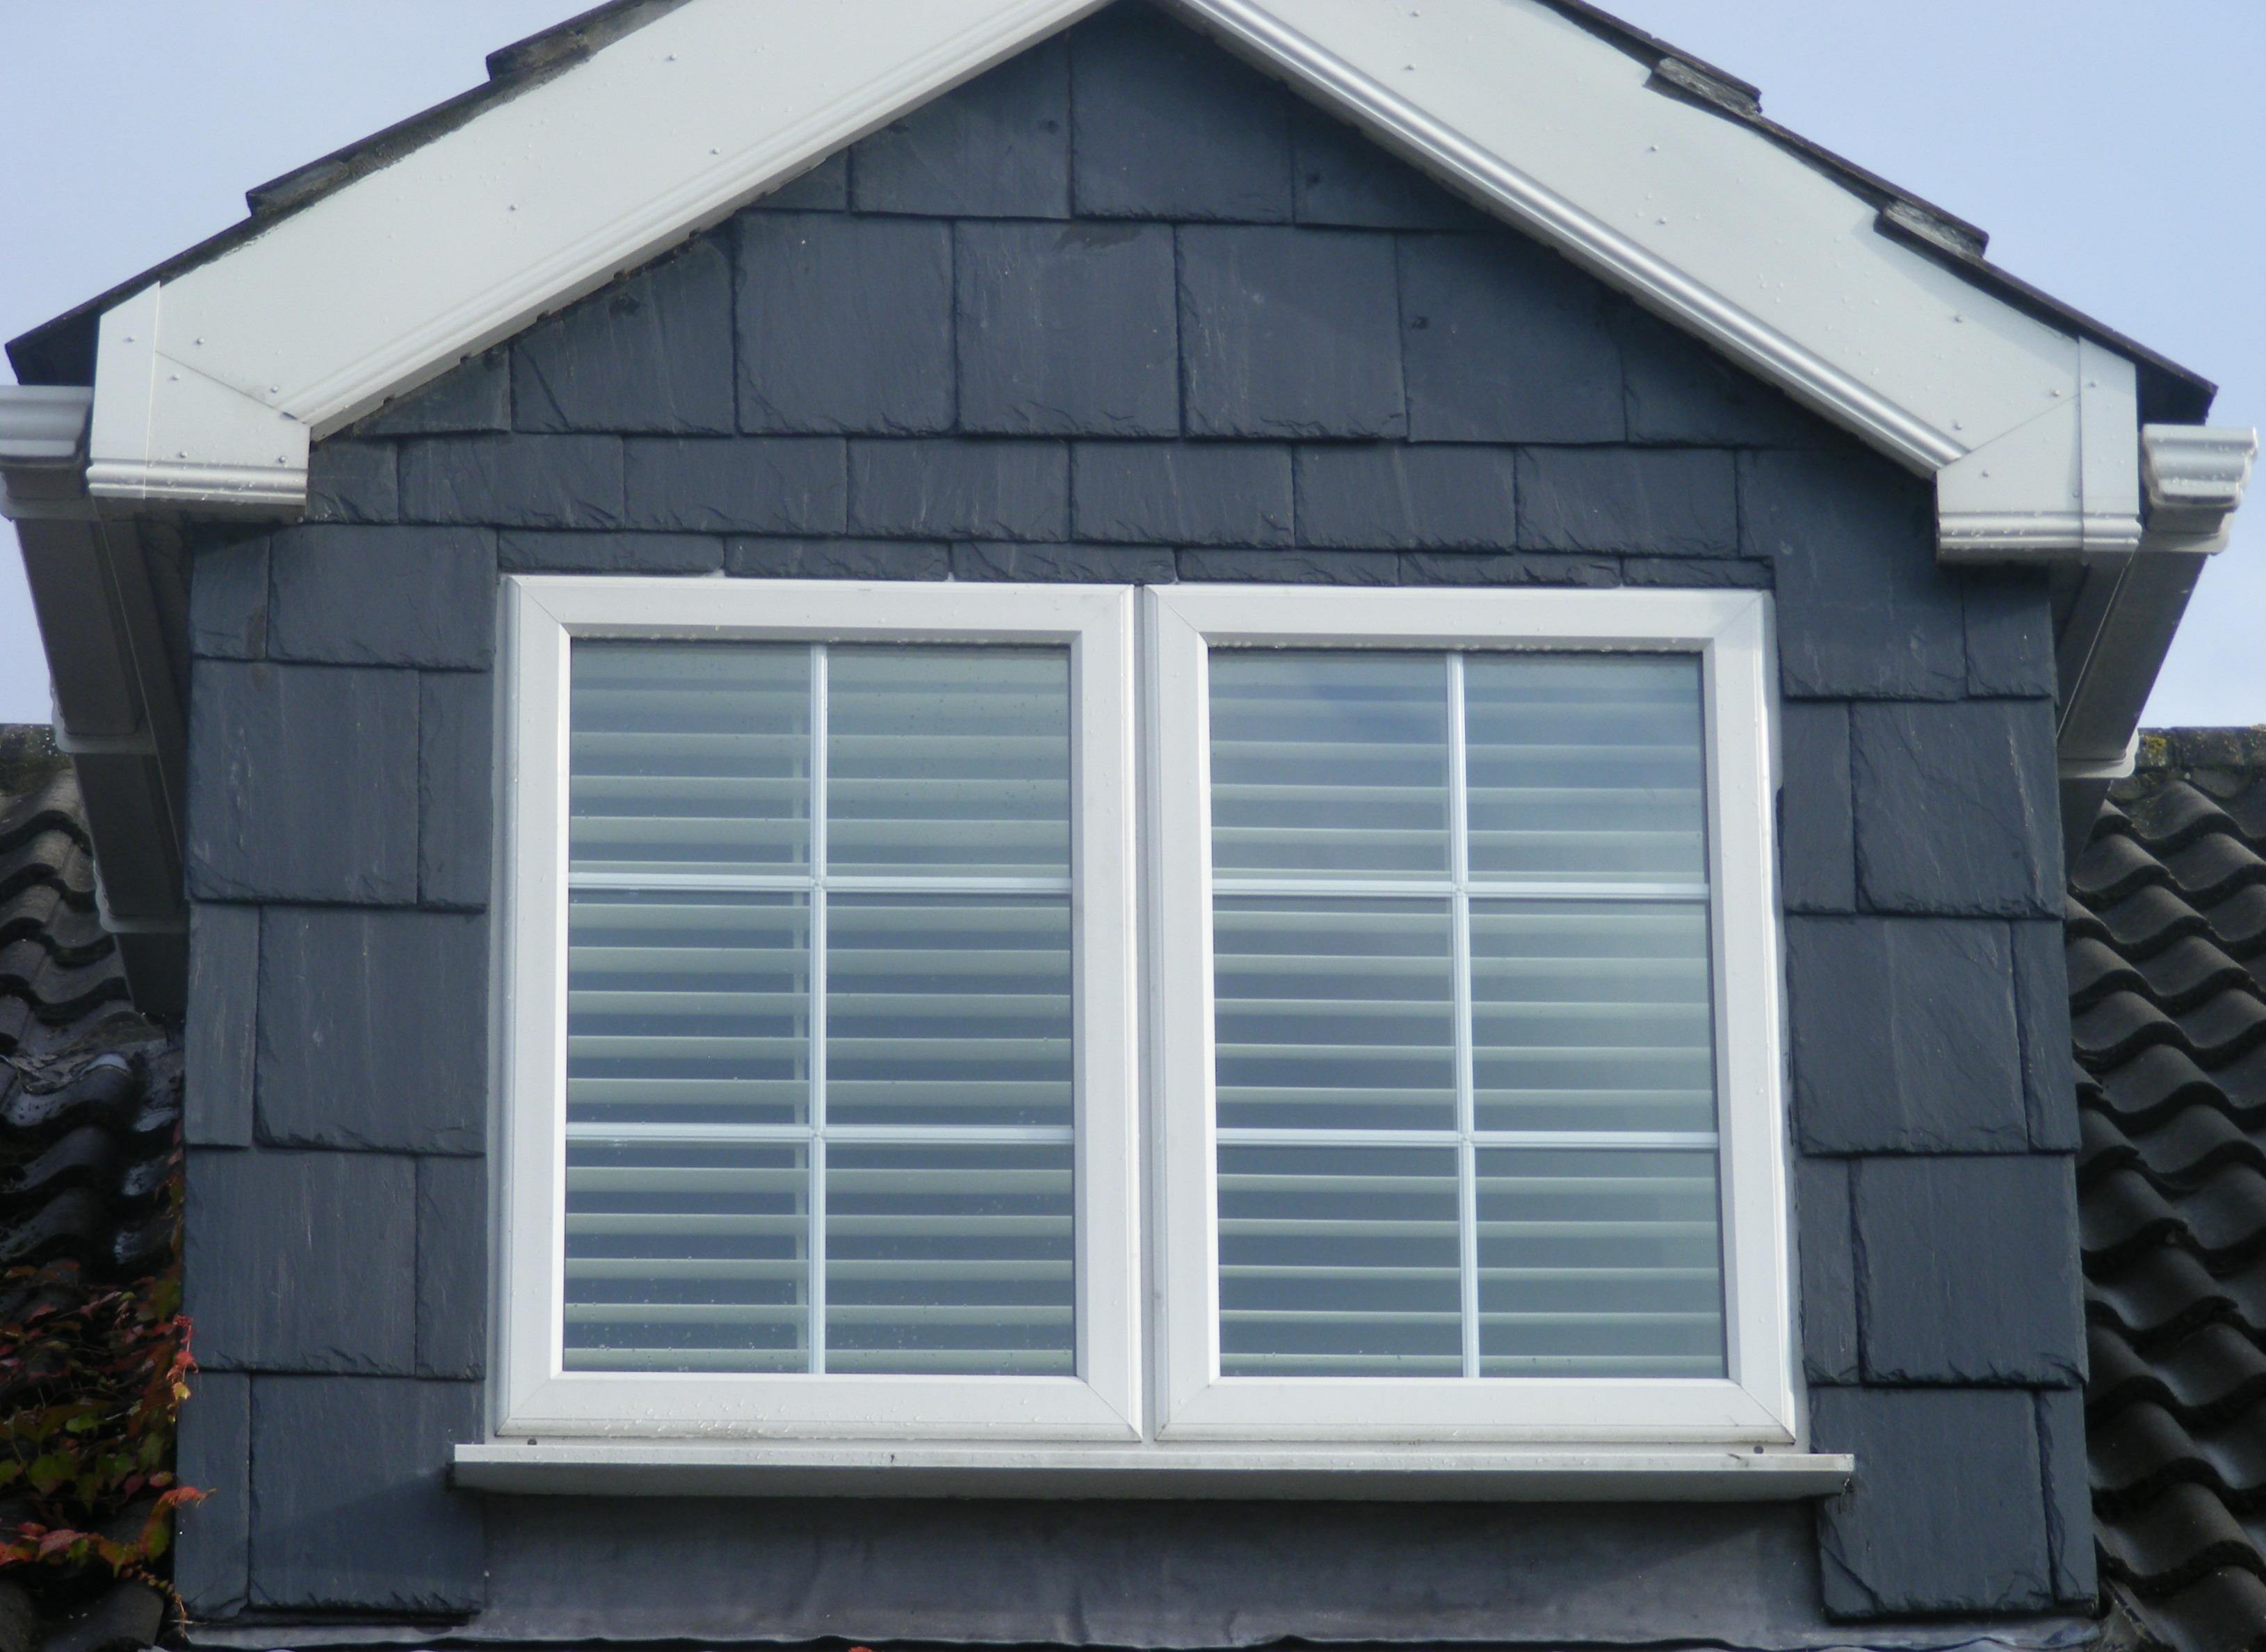 Clontarf Dormer Window Plantation Shutters Outside